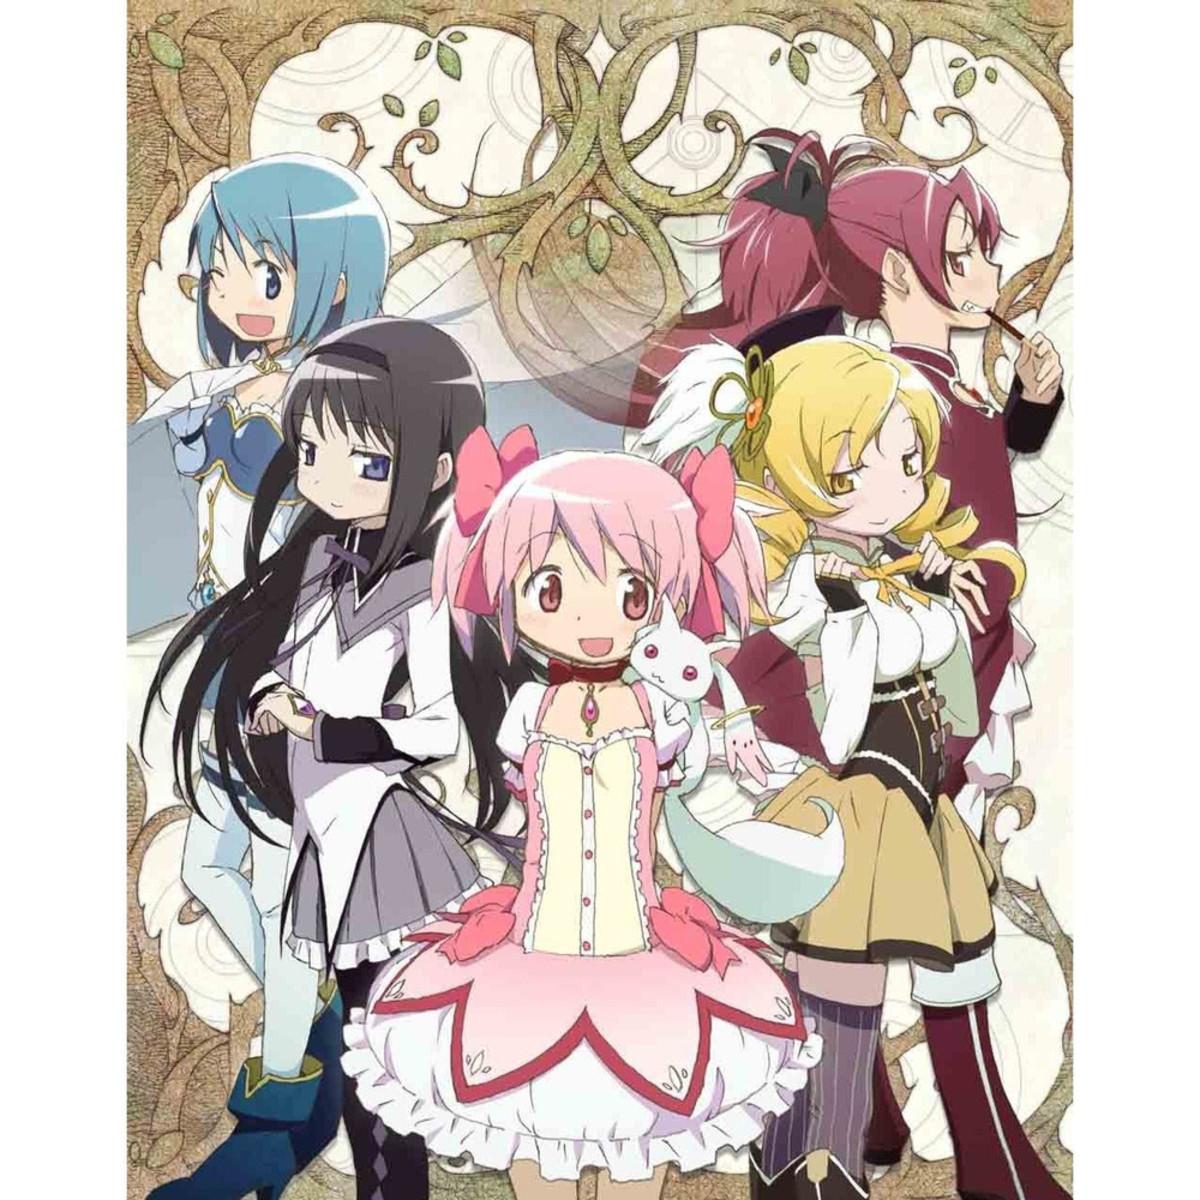 anime-review-puella-magi-madoka-magica-2011